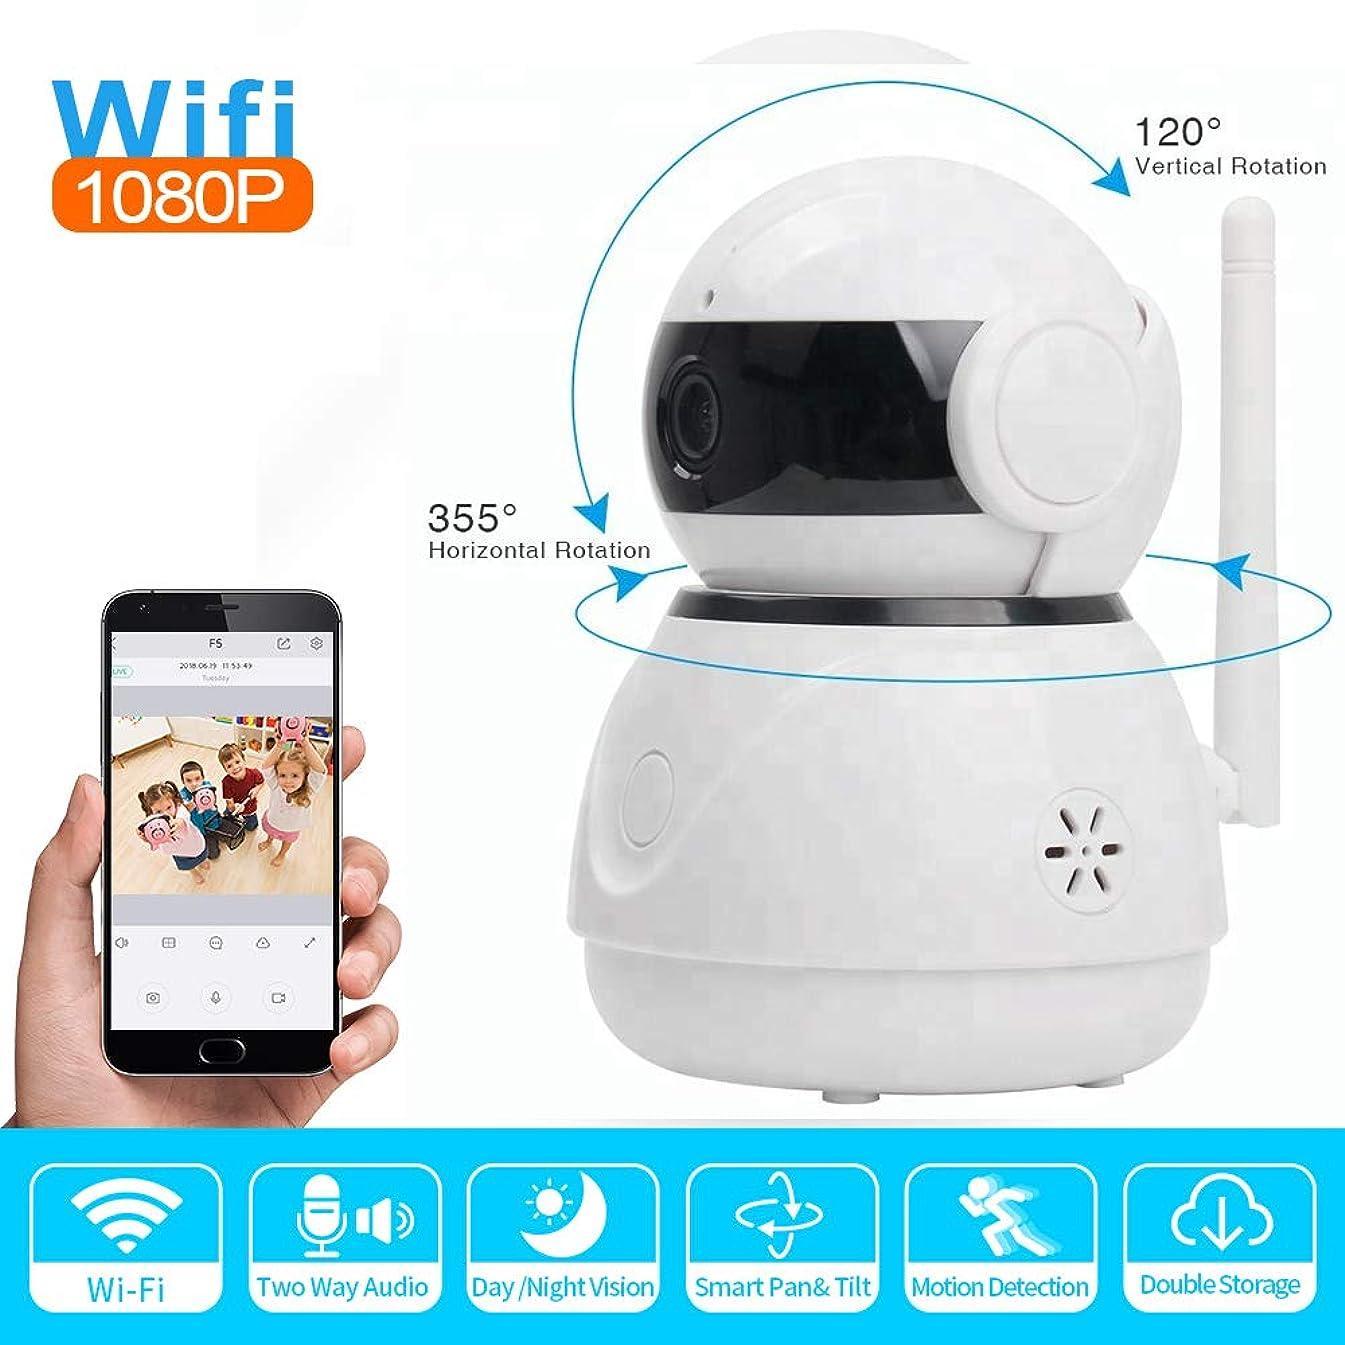 HD IP Camera, 2.0MP Indoor and Outdoor Security Camera1080p Cloud Storage Two-Way Call 360° Pan/Tilt Pan/Tilt/Zoom Motion Detection